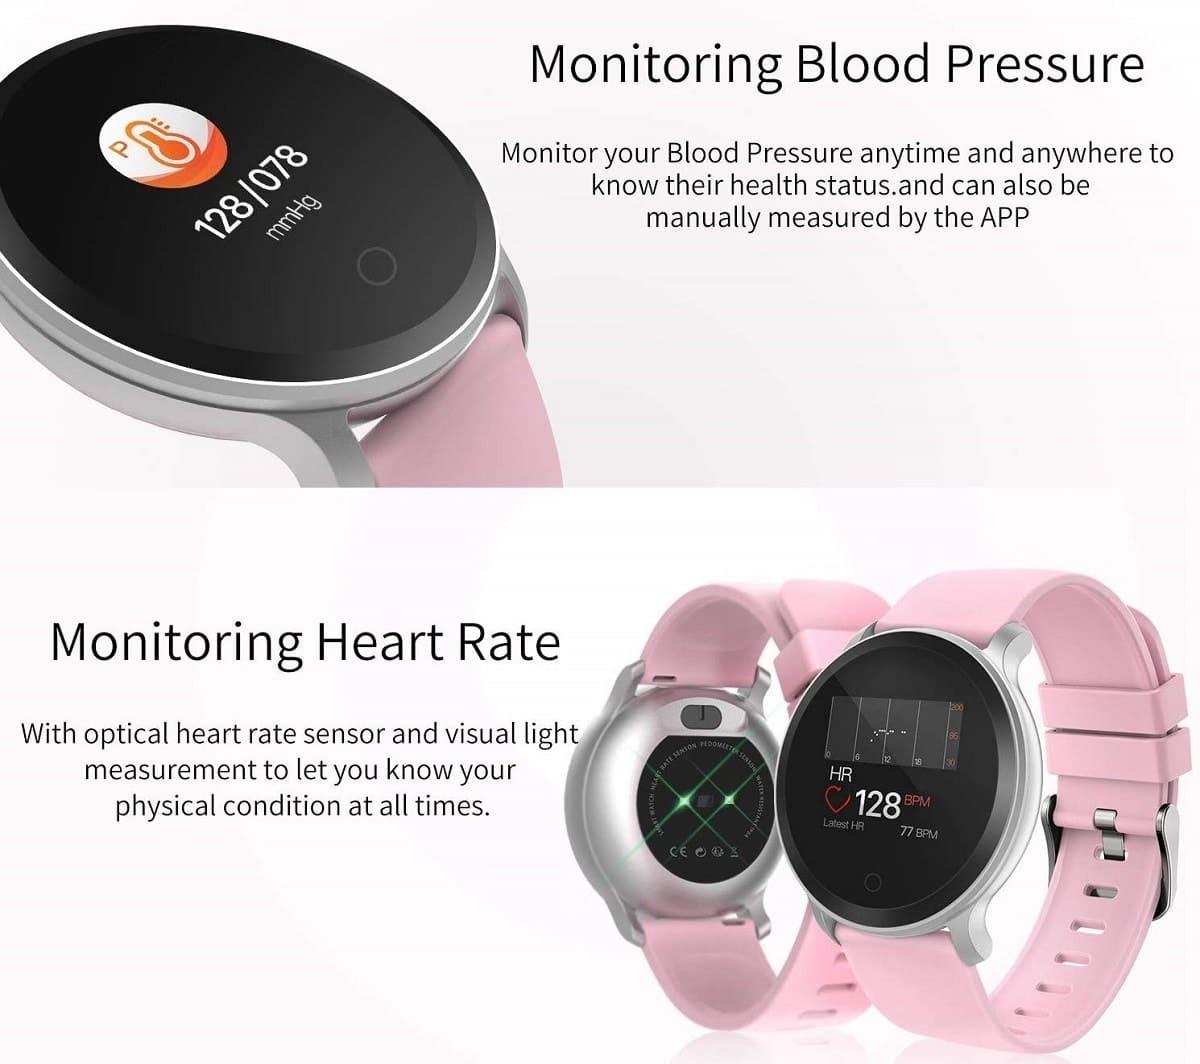 morefit smartwatch 2 image